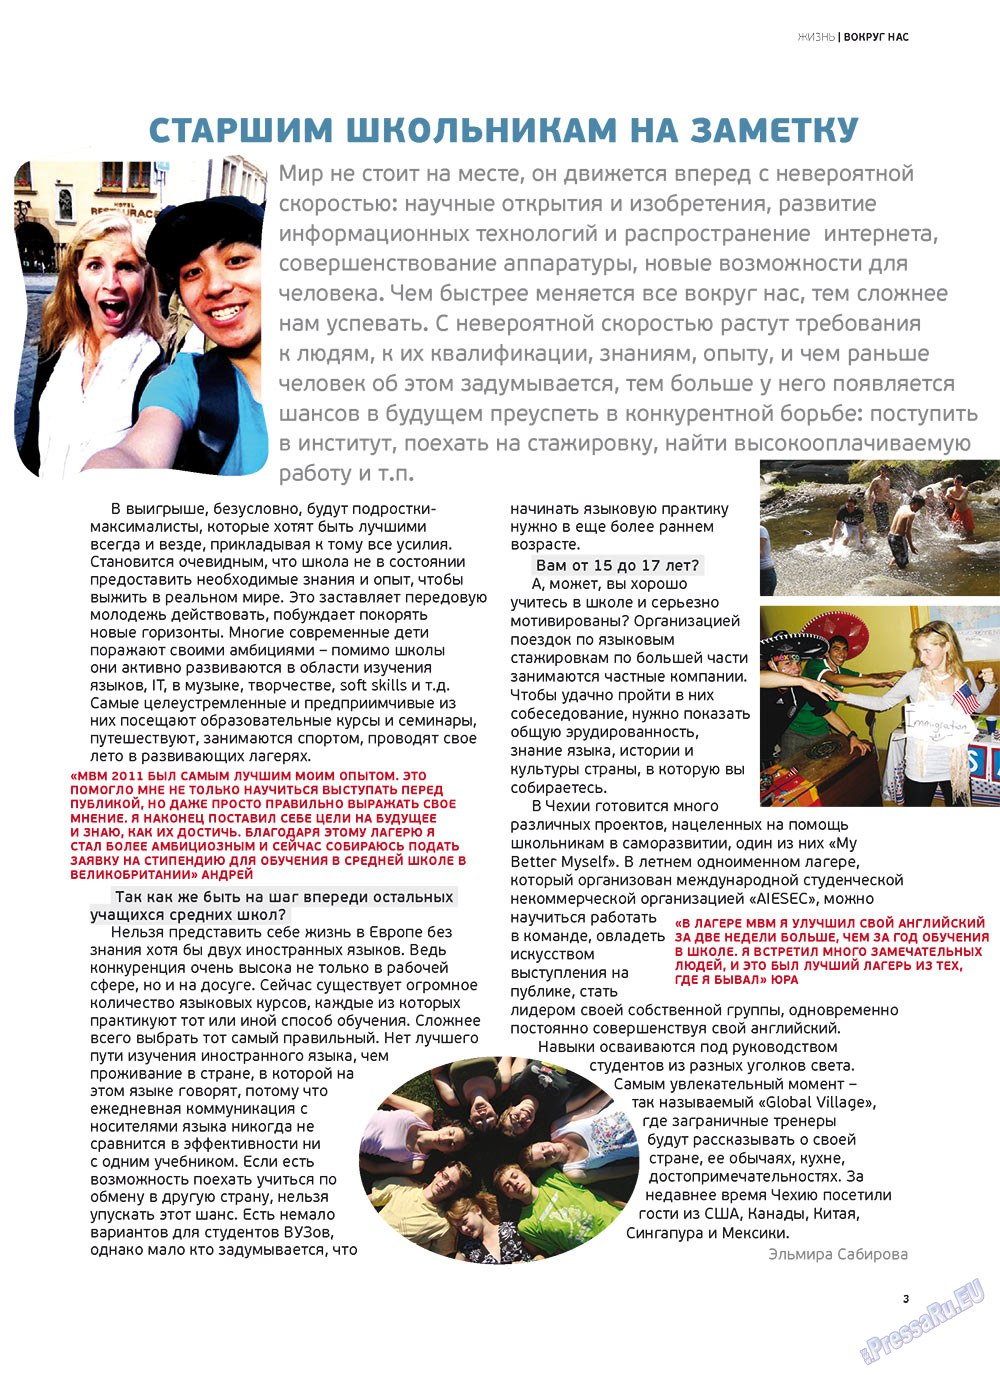 Артек (журнал). 2012 год, номер 1, стр. 5